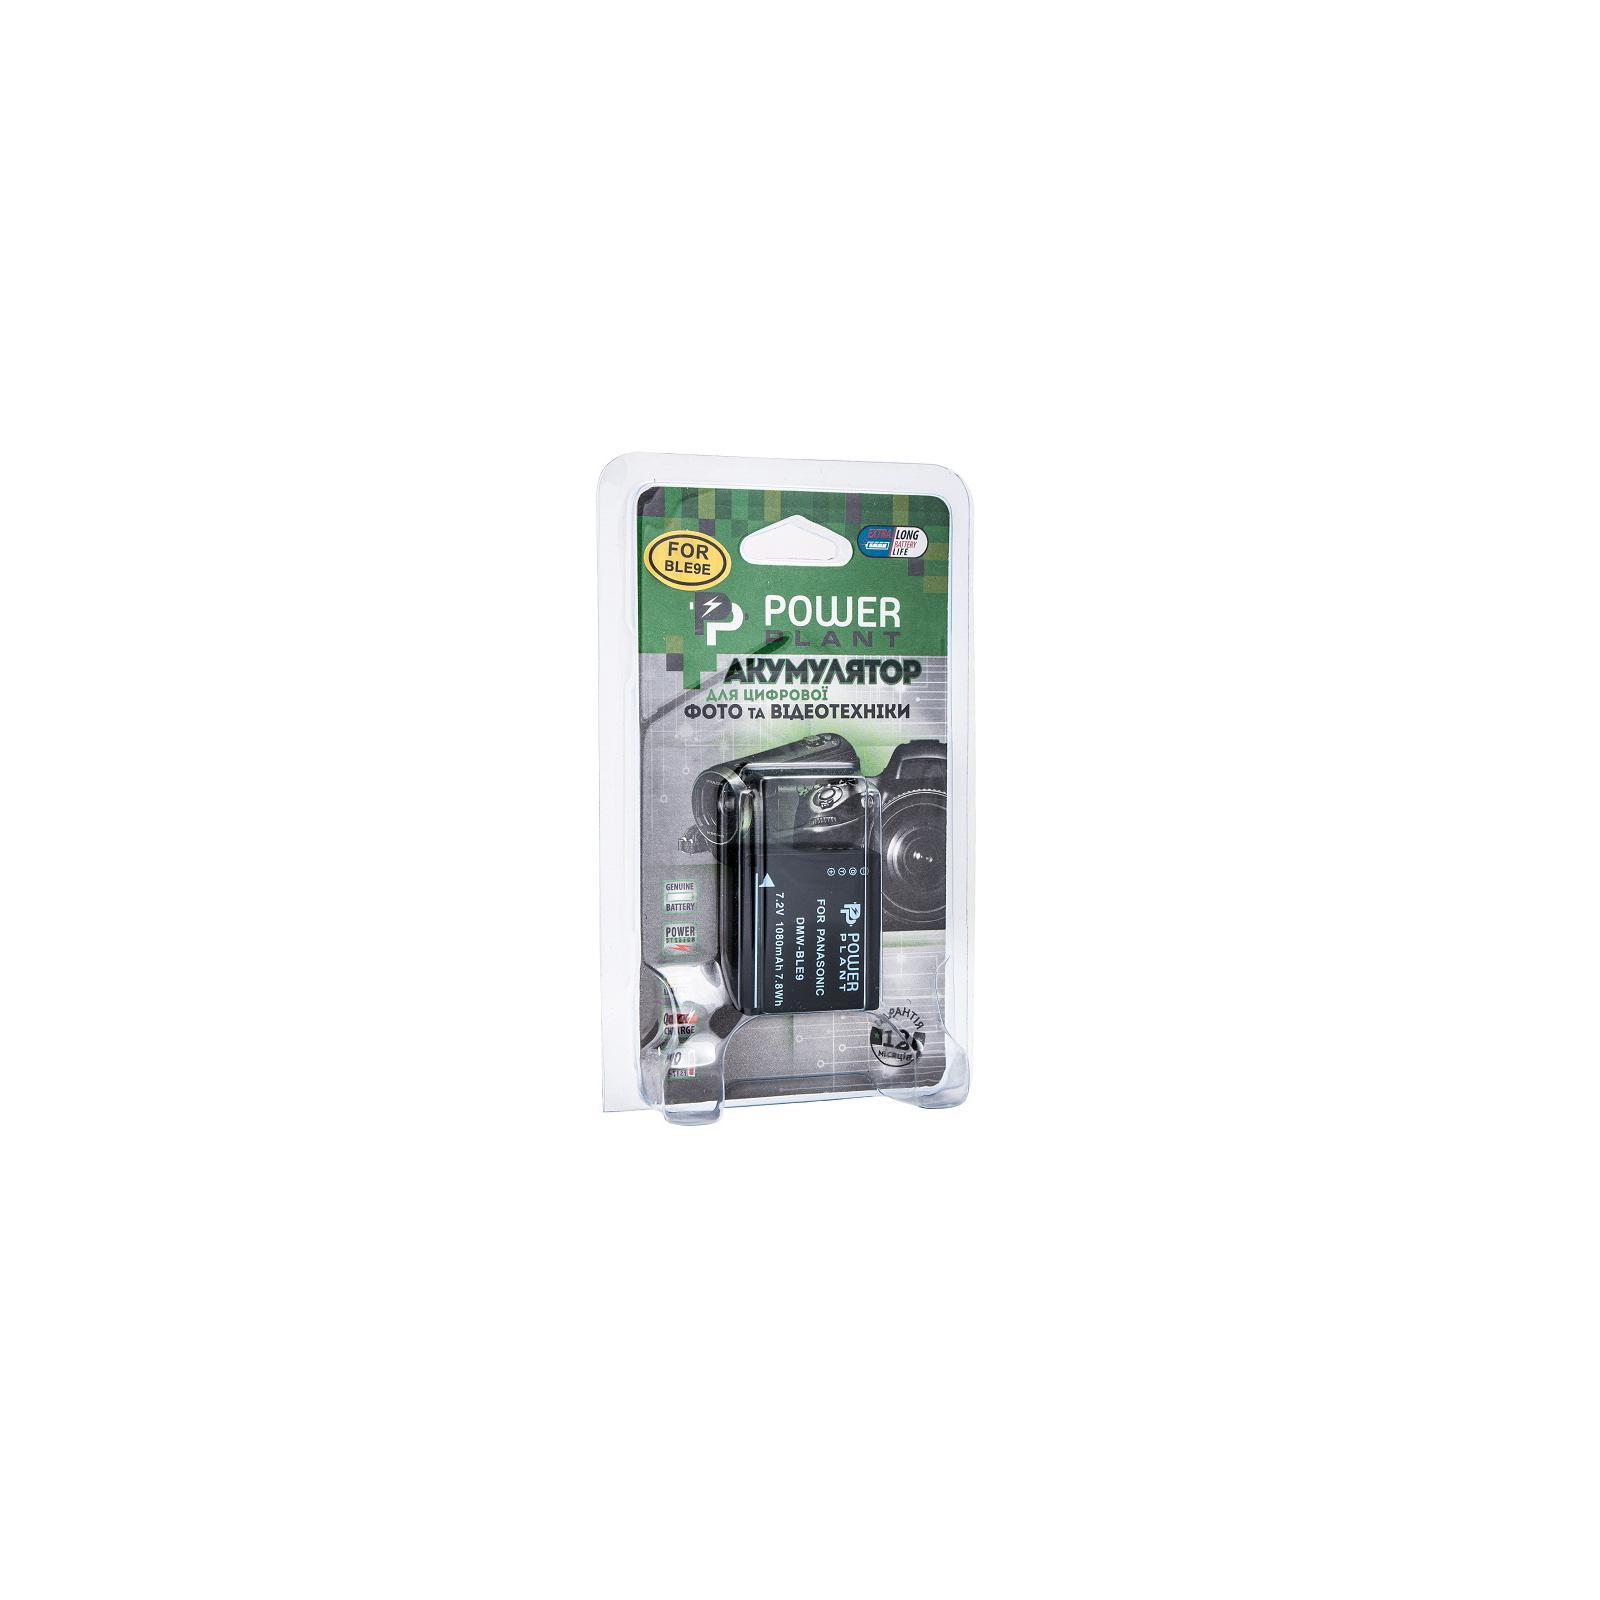 Аккумулятор к фото/видео PowerPlant Panasonic DMW-BLE9 (DV00DV1299) изображение 2